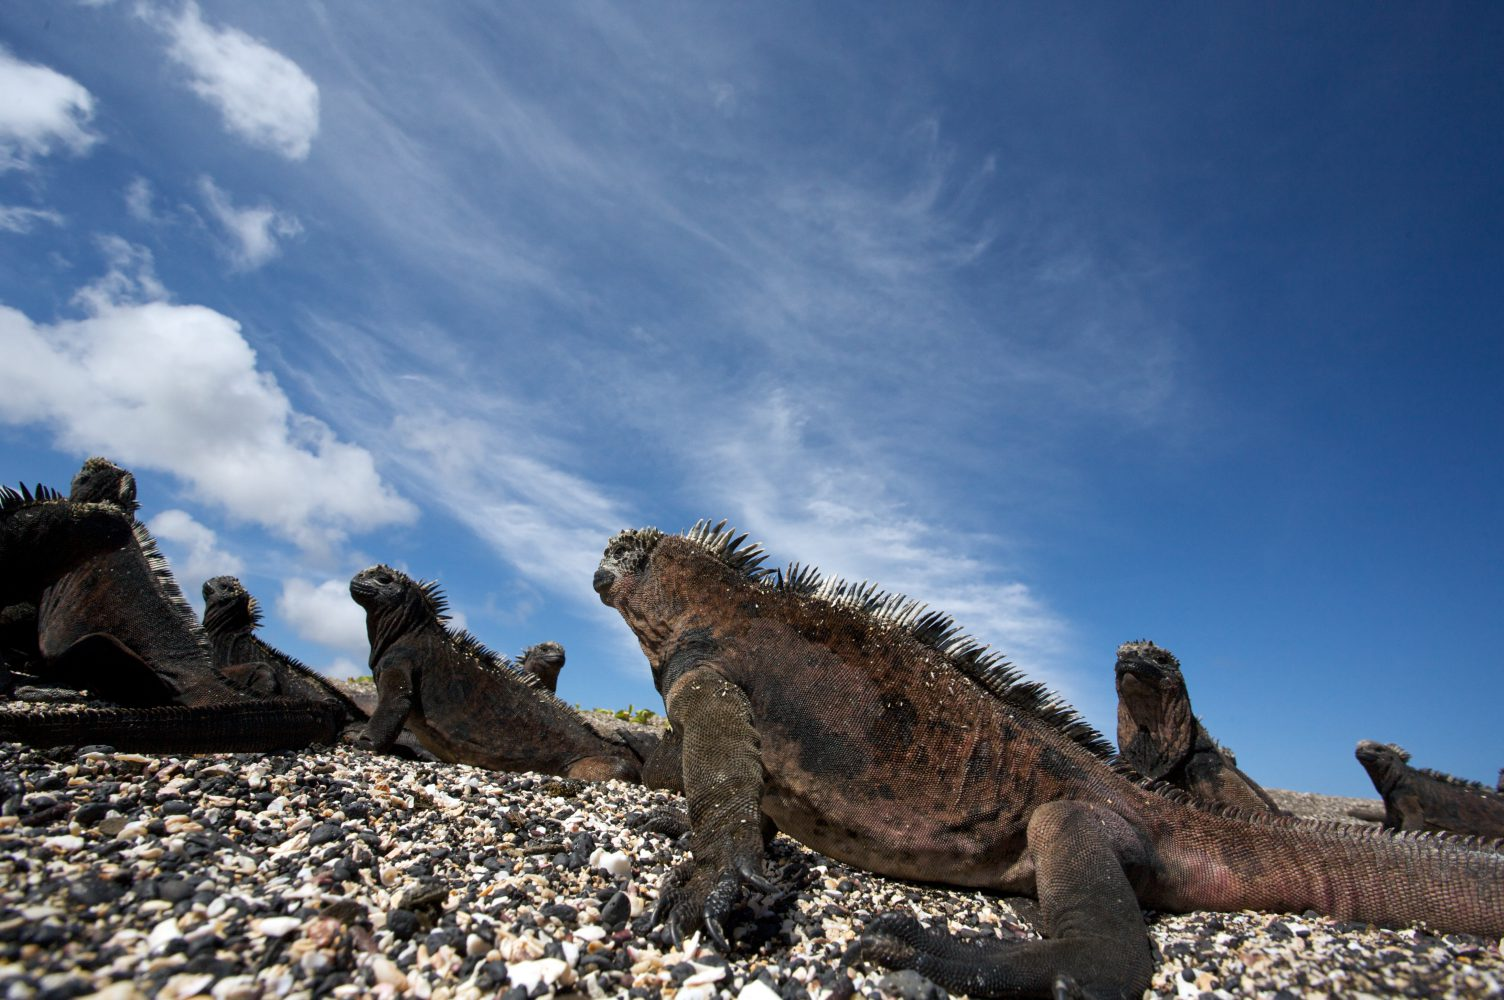 Cruising Galápagos: The Land Before Time